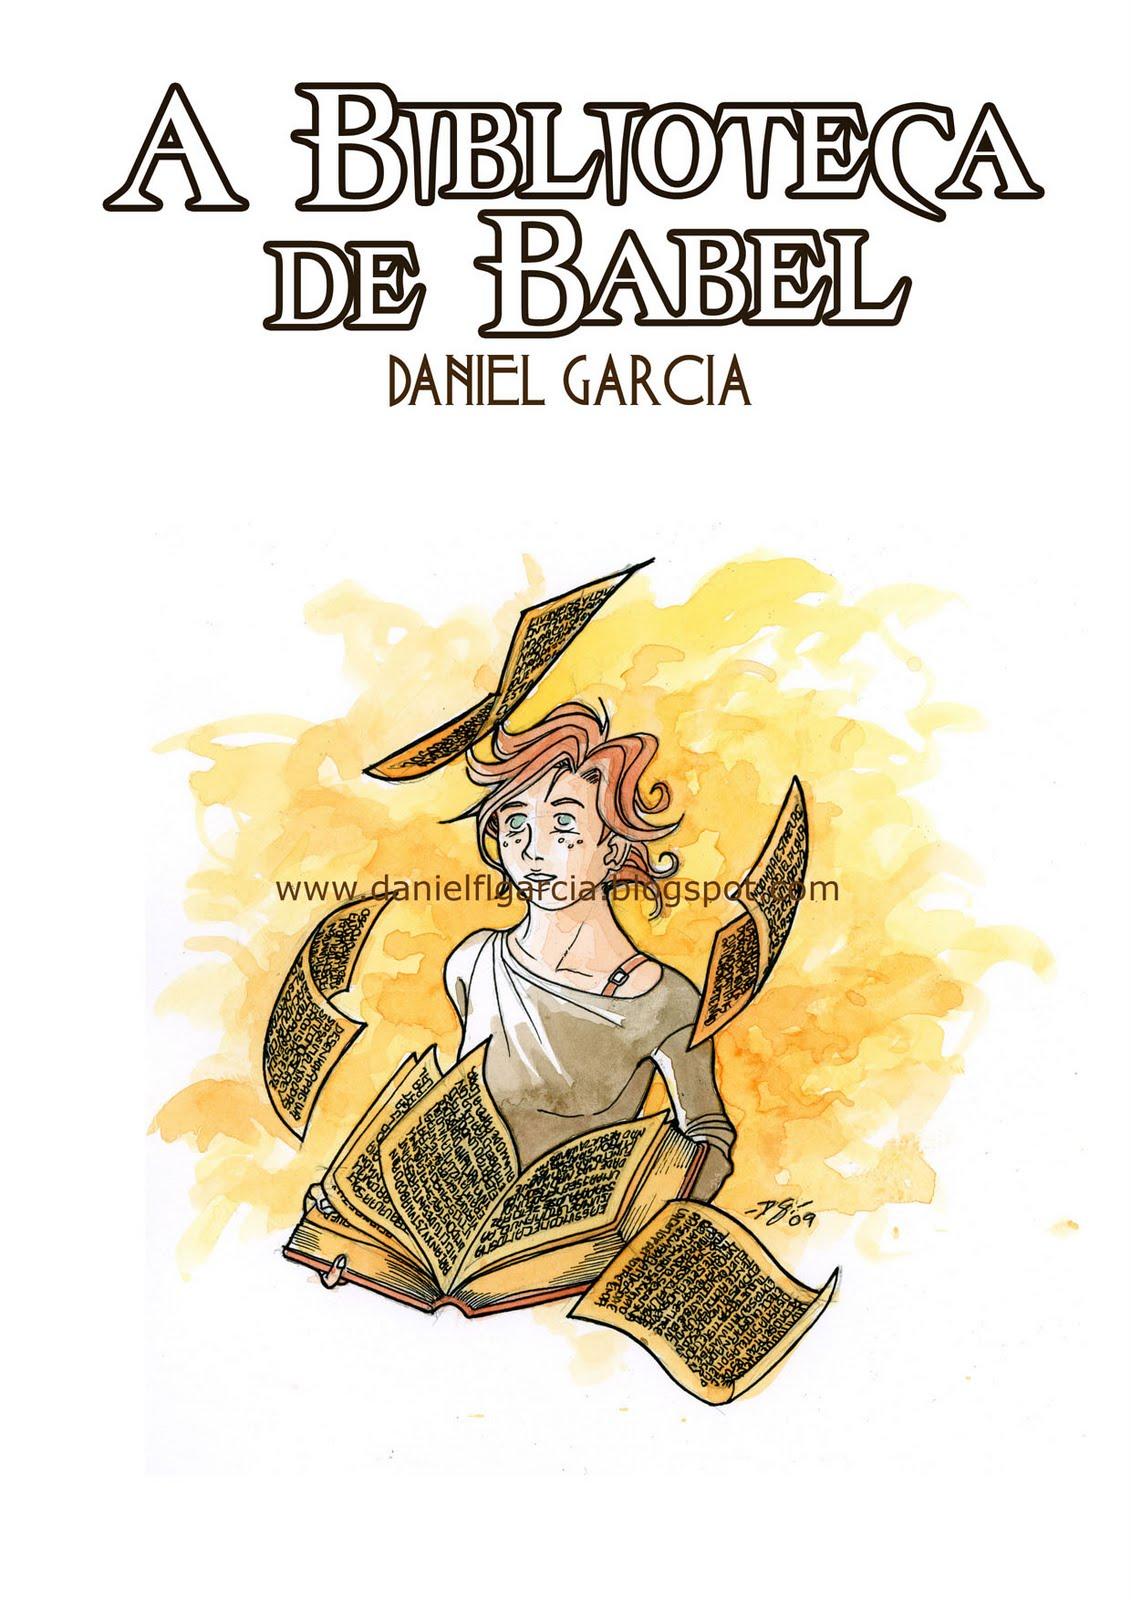 DANIEL GARCIA Graphic Art: A Biblioteca de Babel - Versão